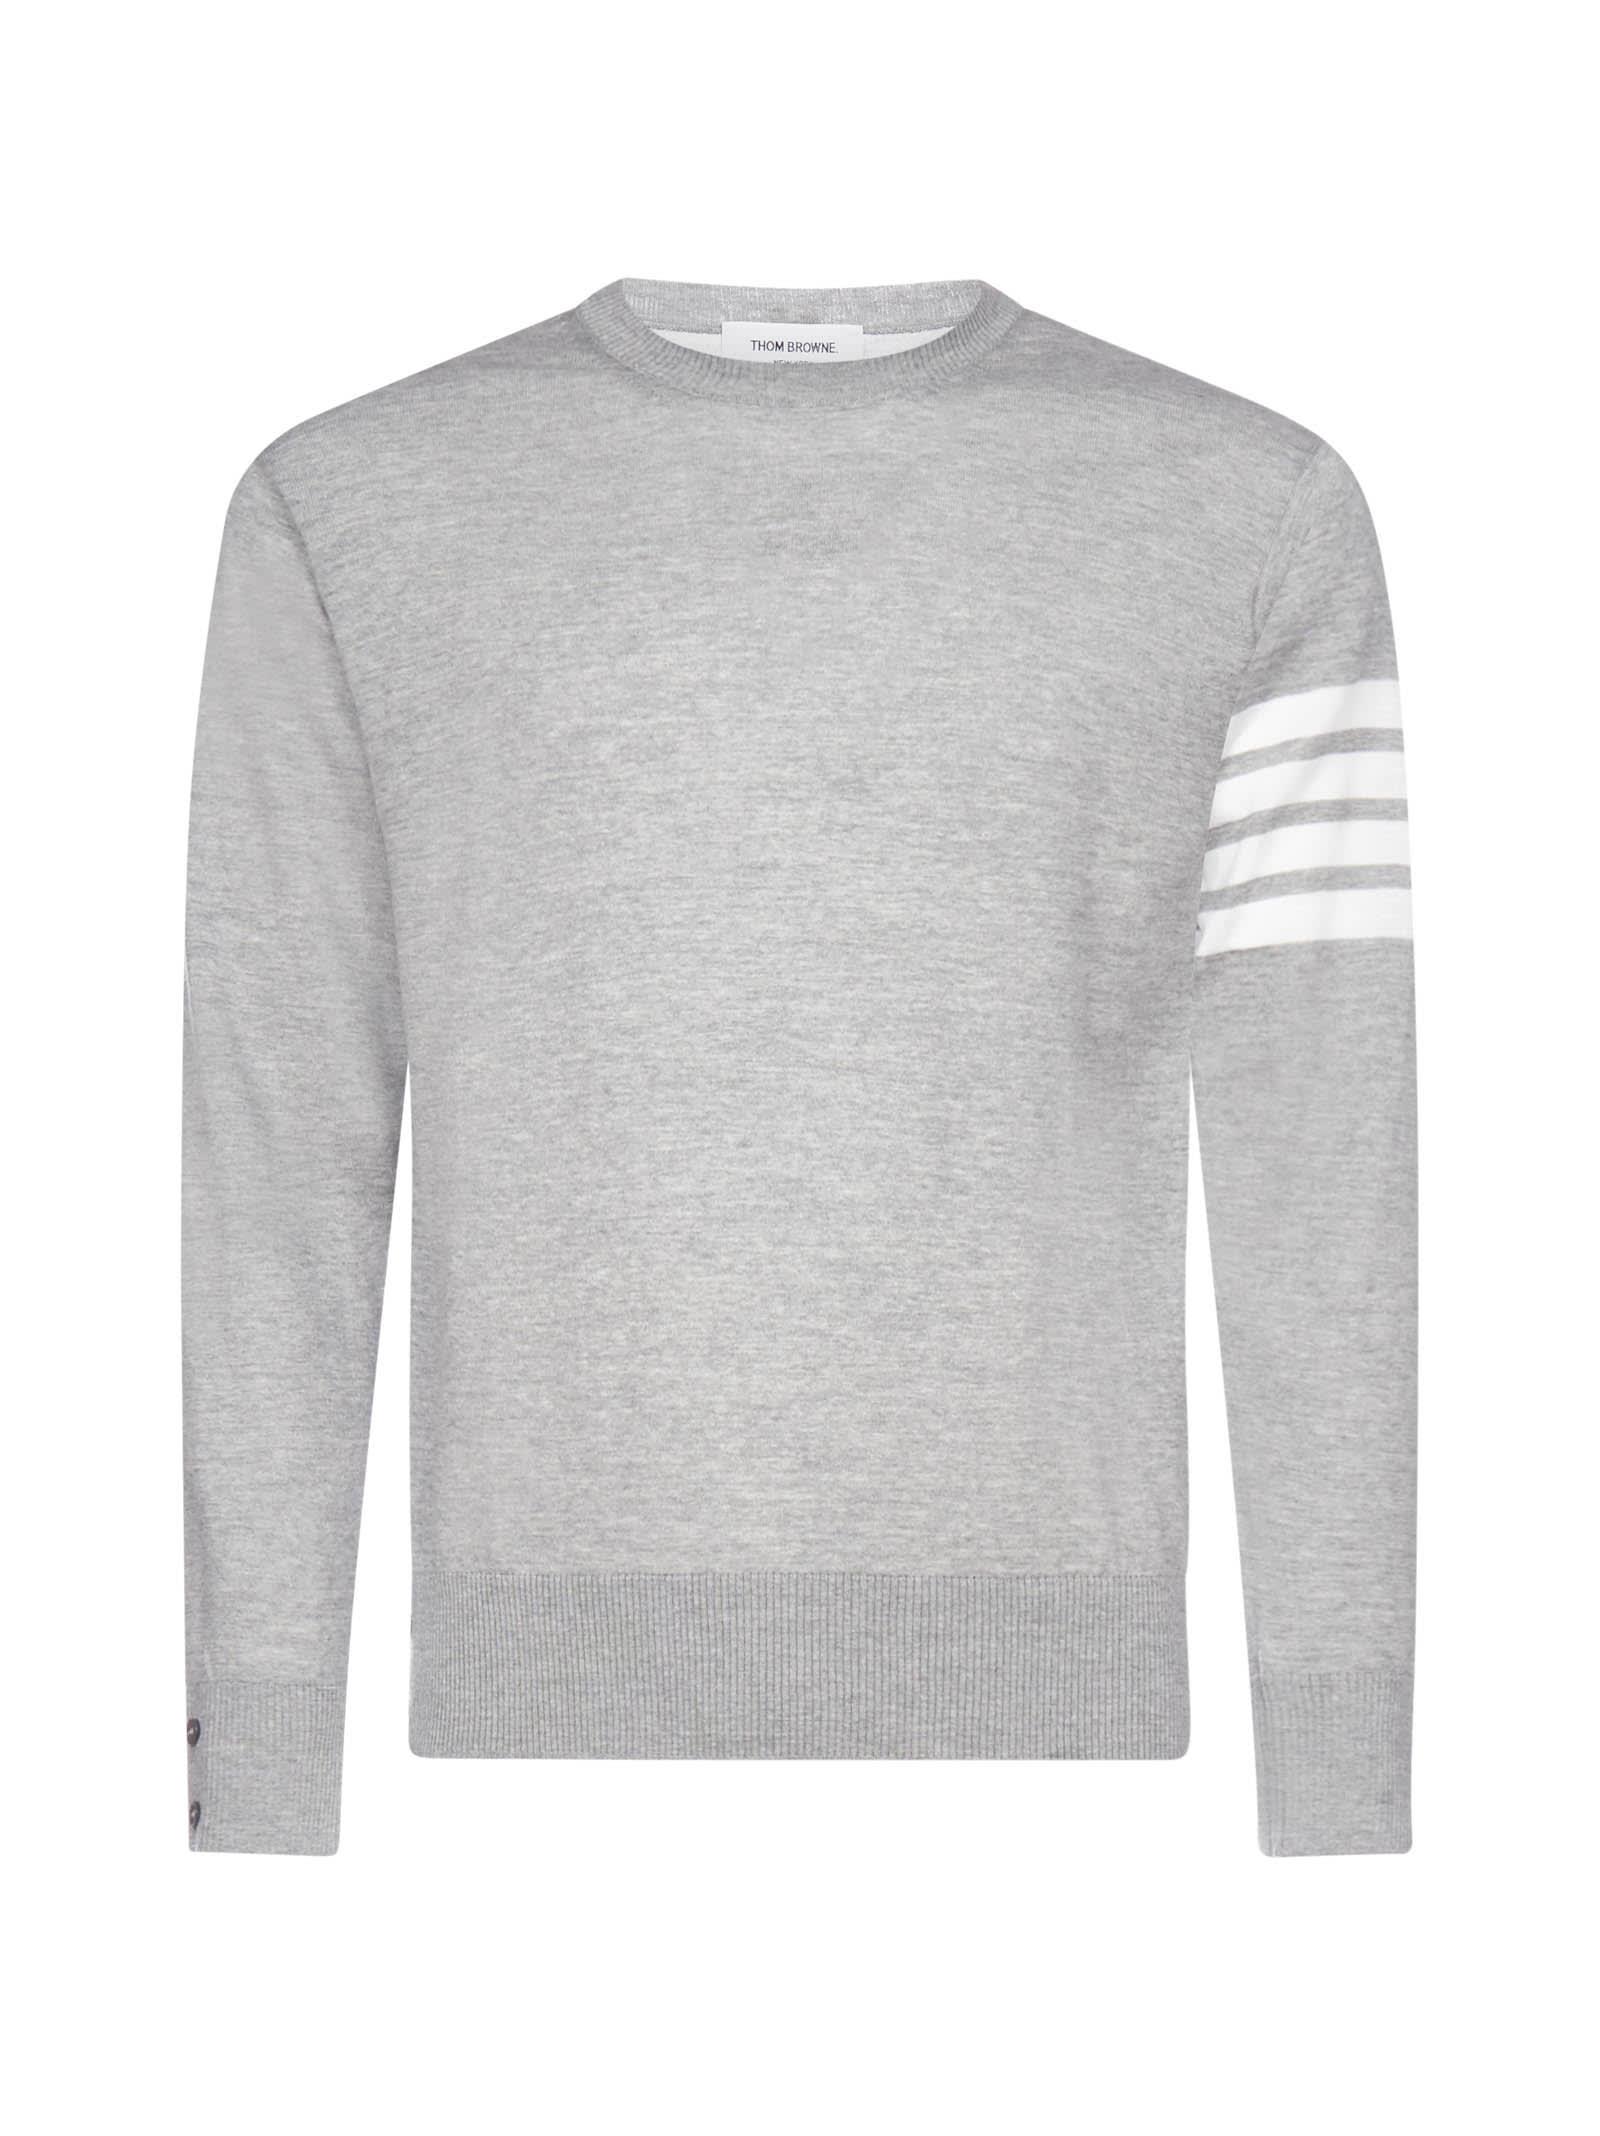 Thom Browne 4-bar Merino Wool Sweater